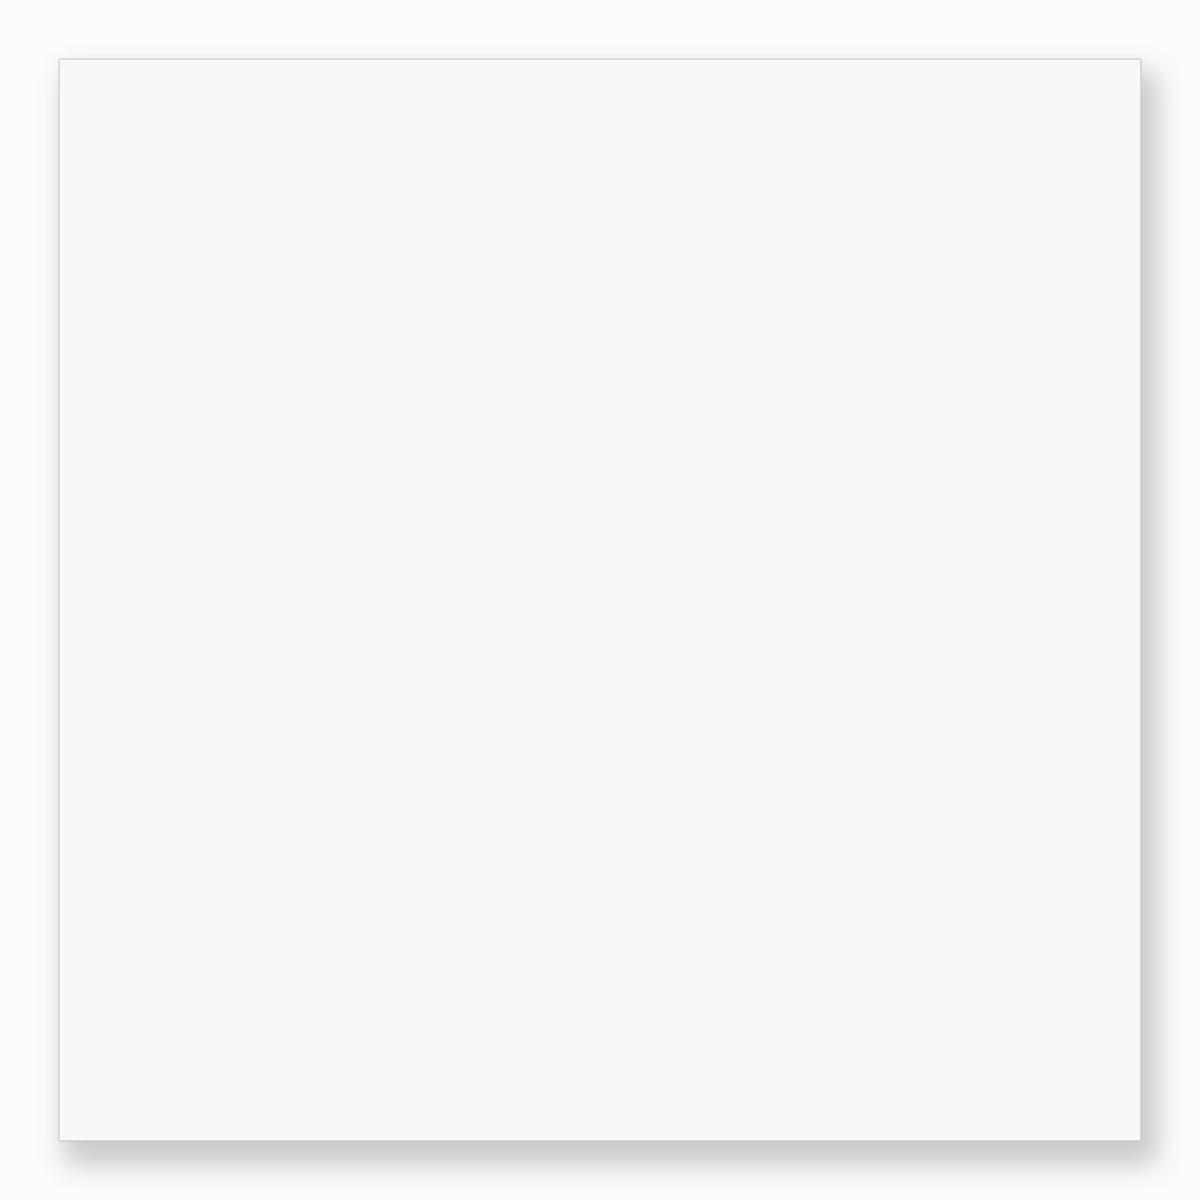 Porcelanato Cotton Acetinado 63x63 Cx.2,38